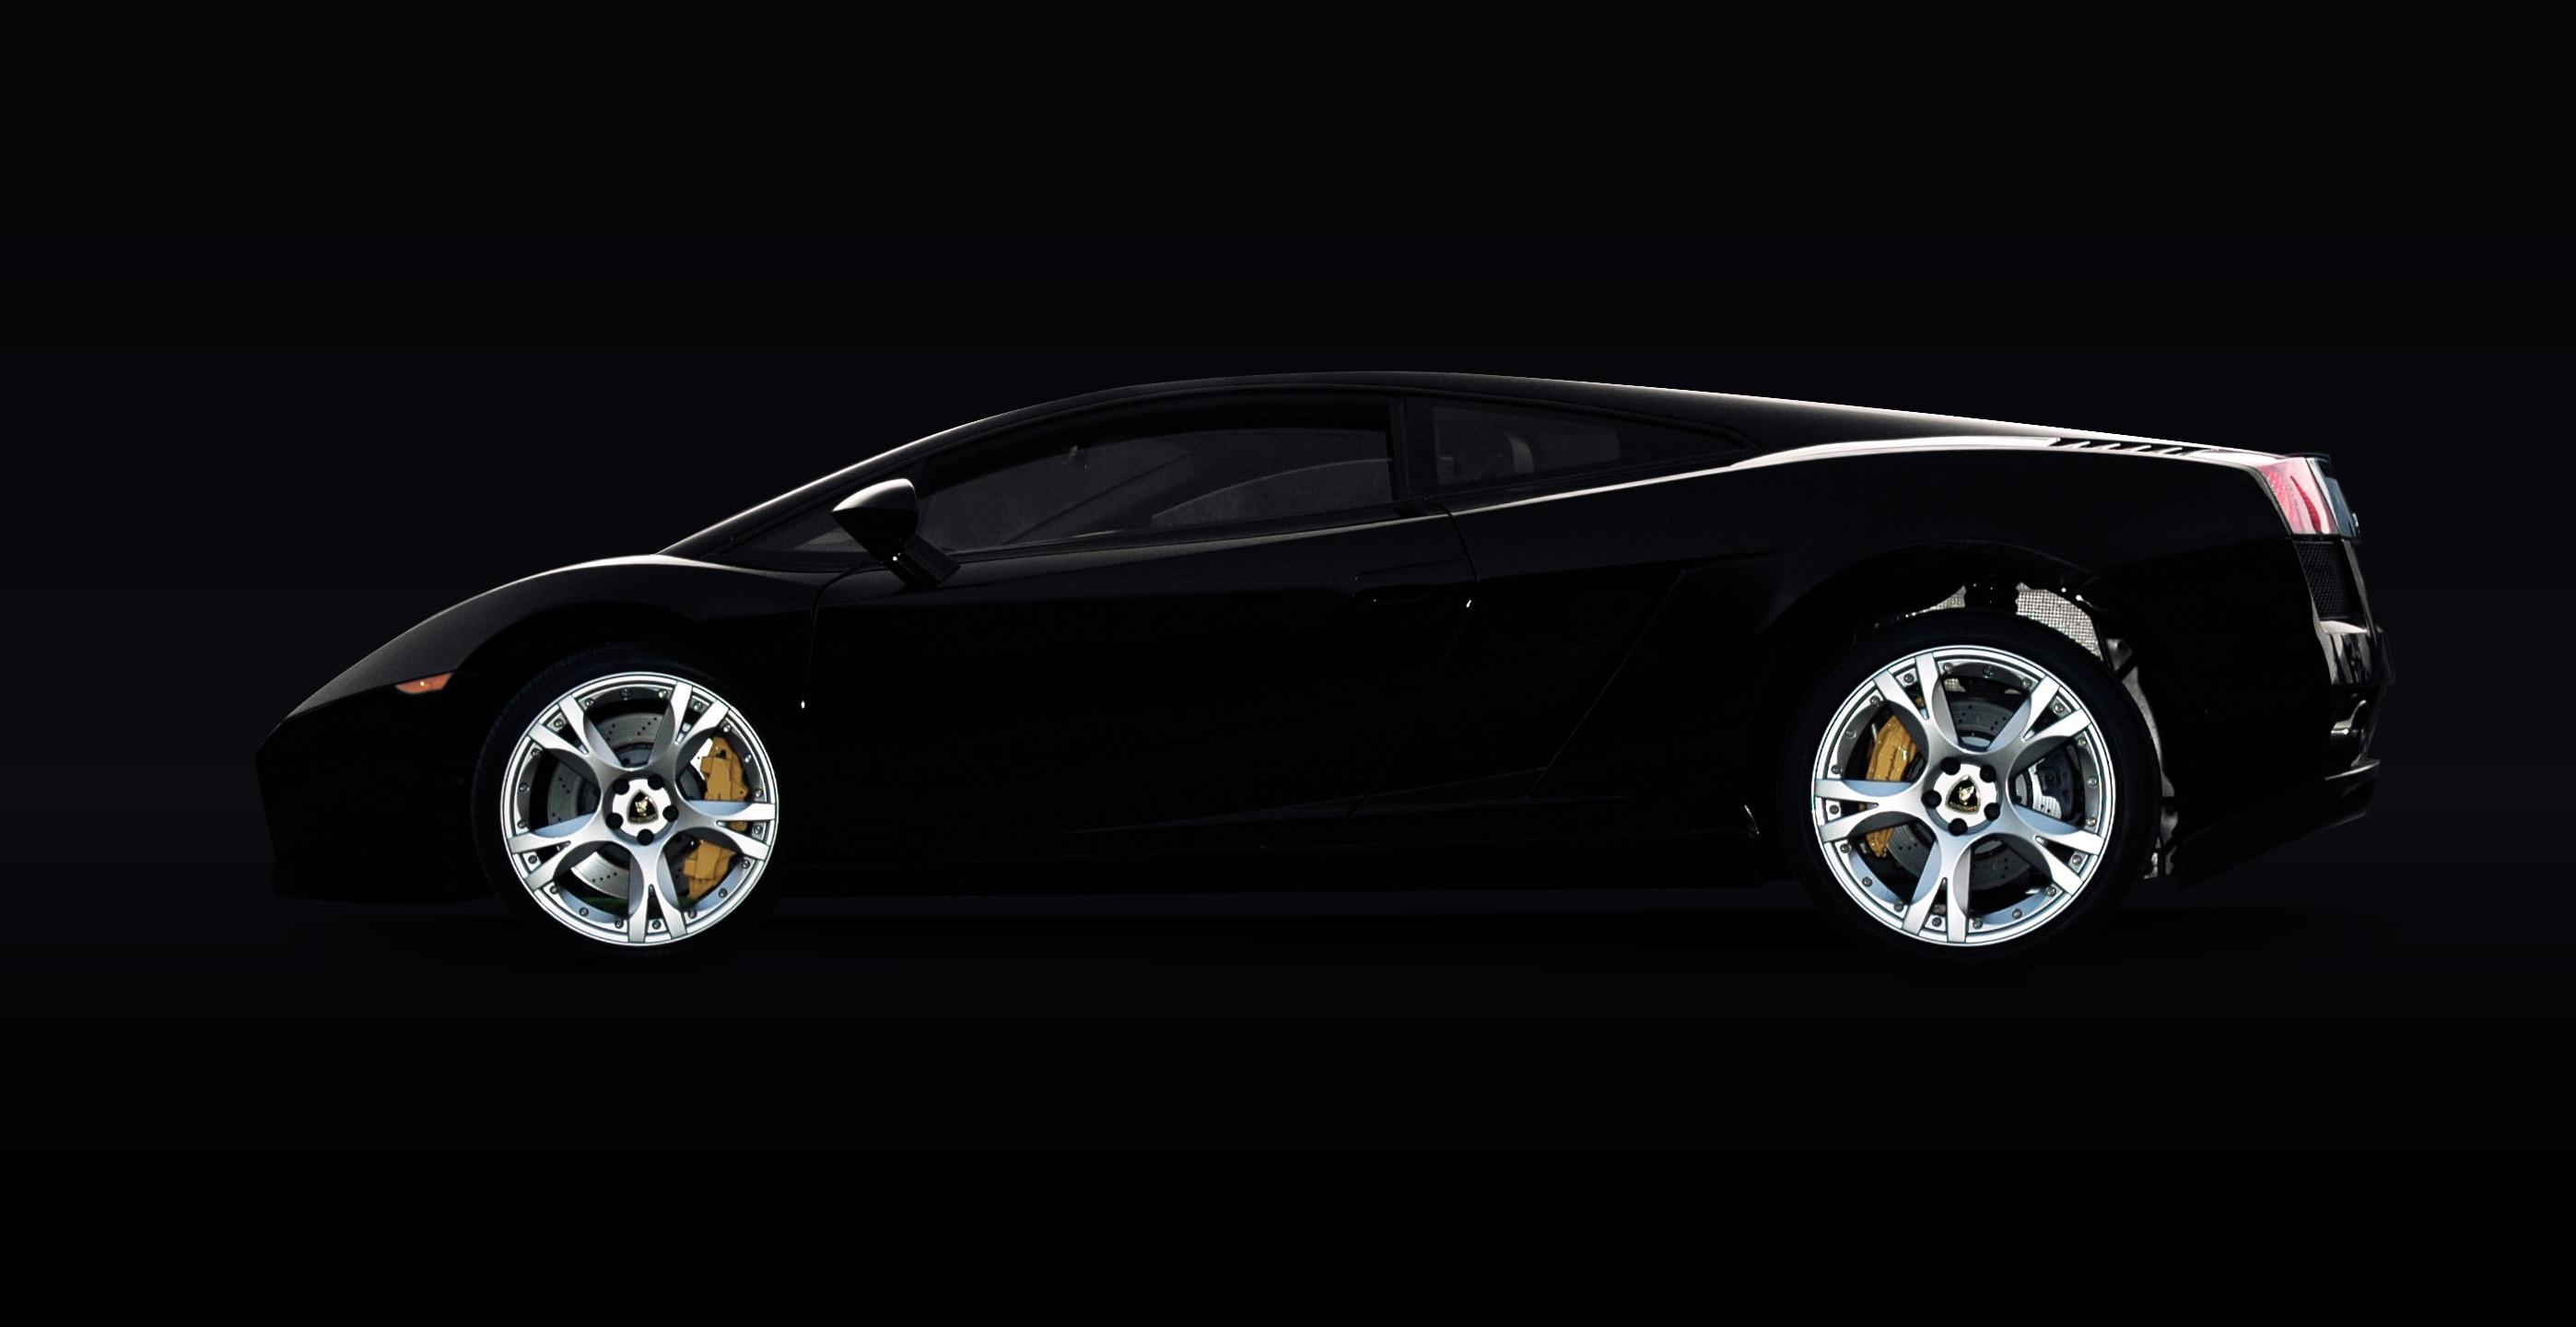 Black Lamborghini Murcielago